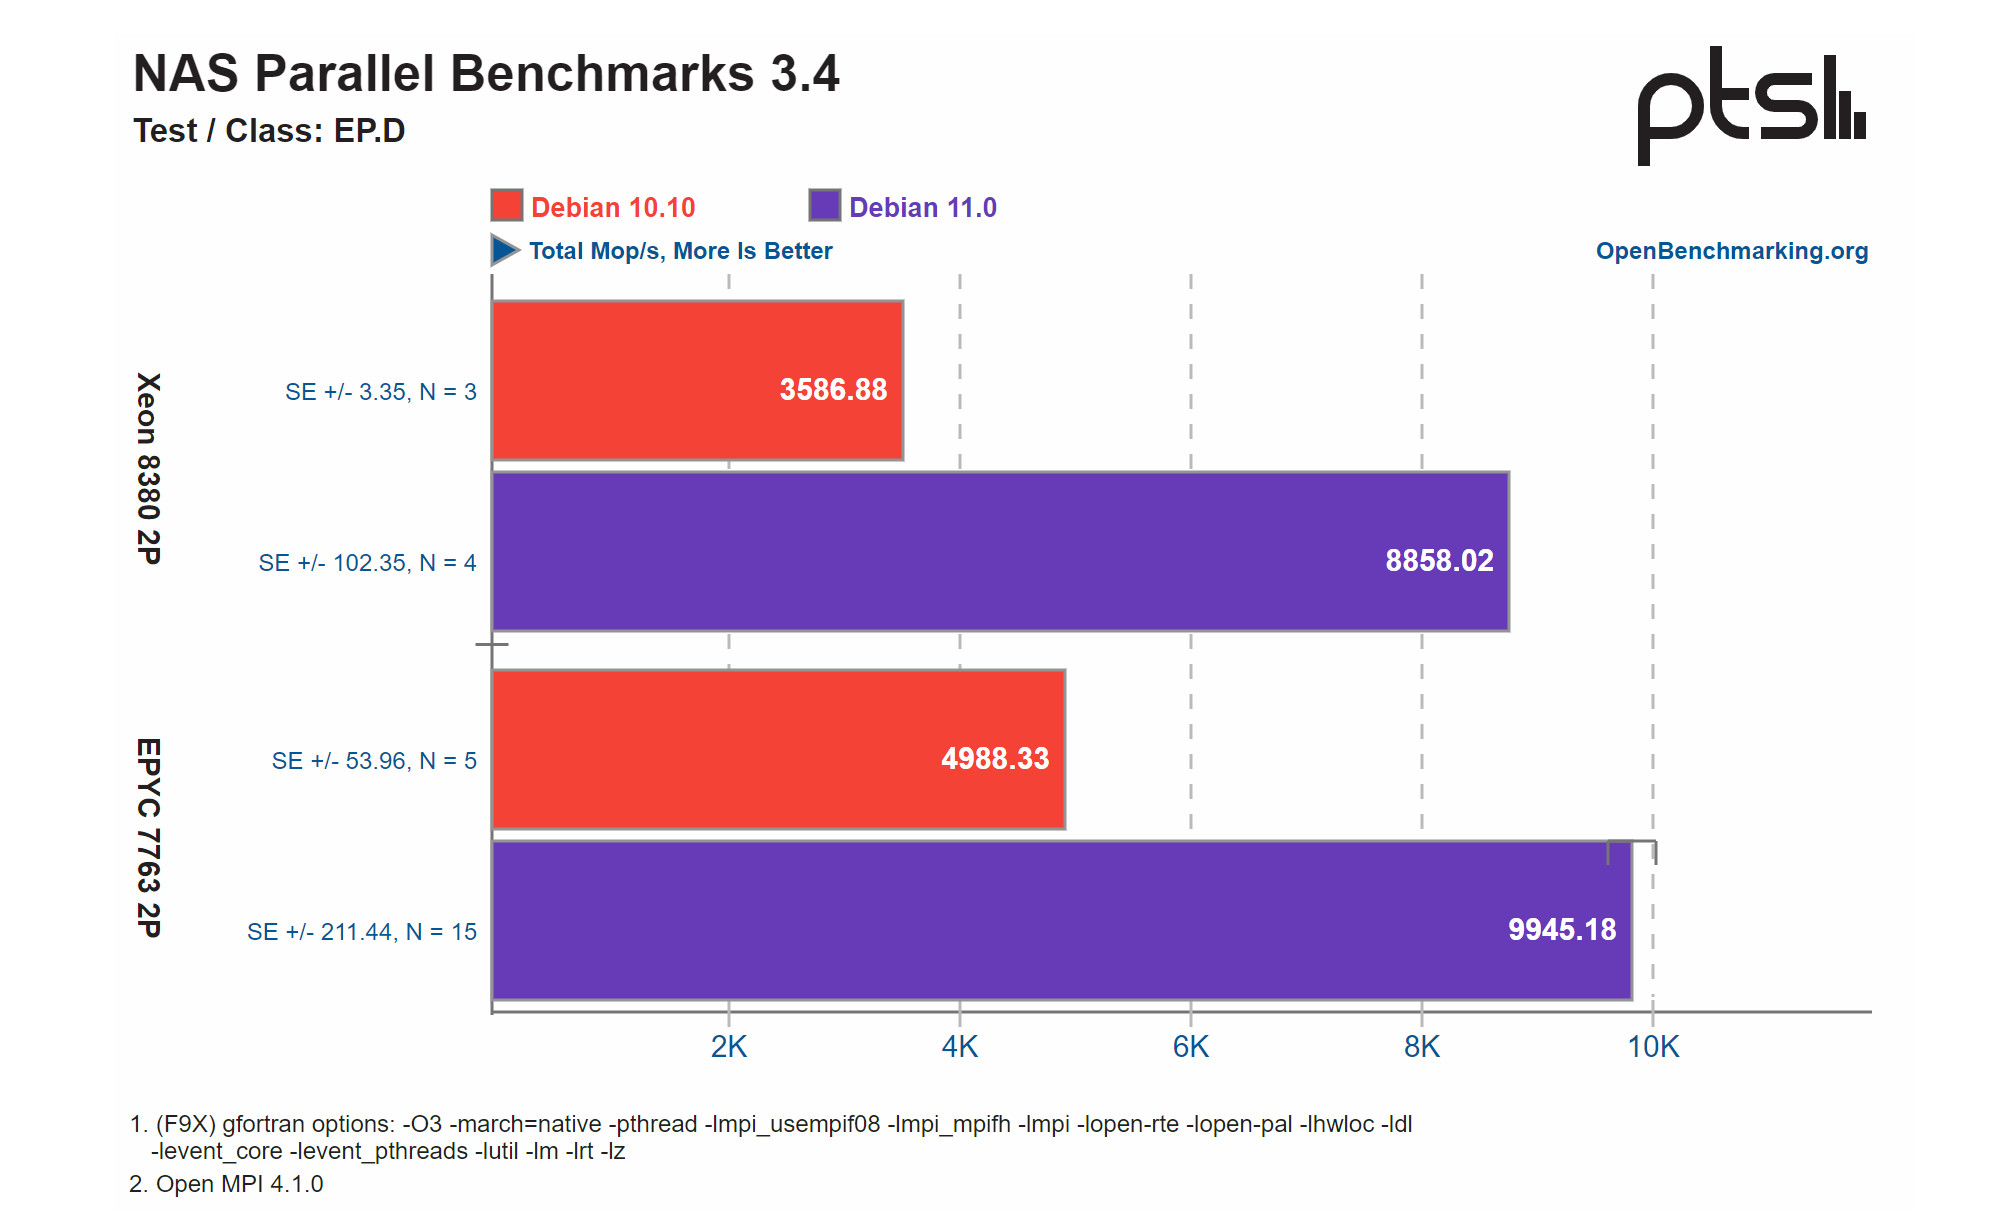 Debian 11 performance vs Debian 10 in NPB EP class D test